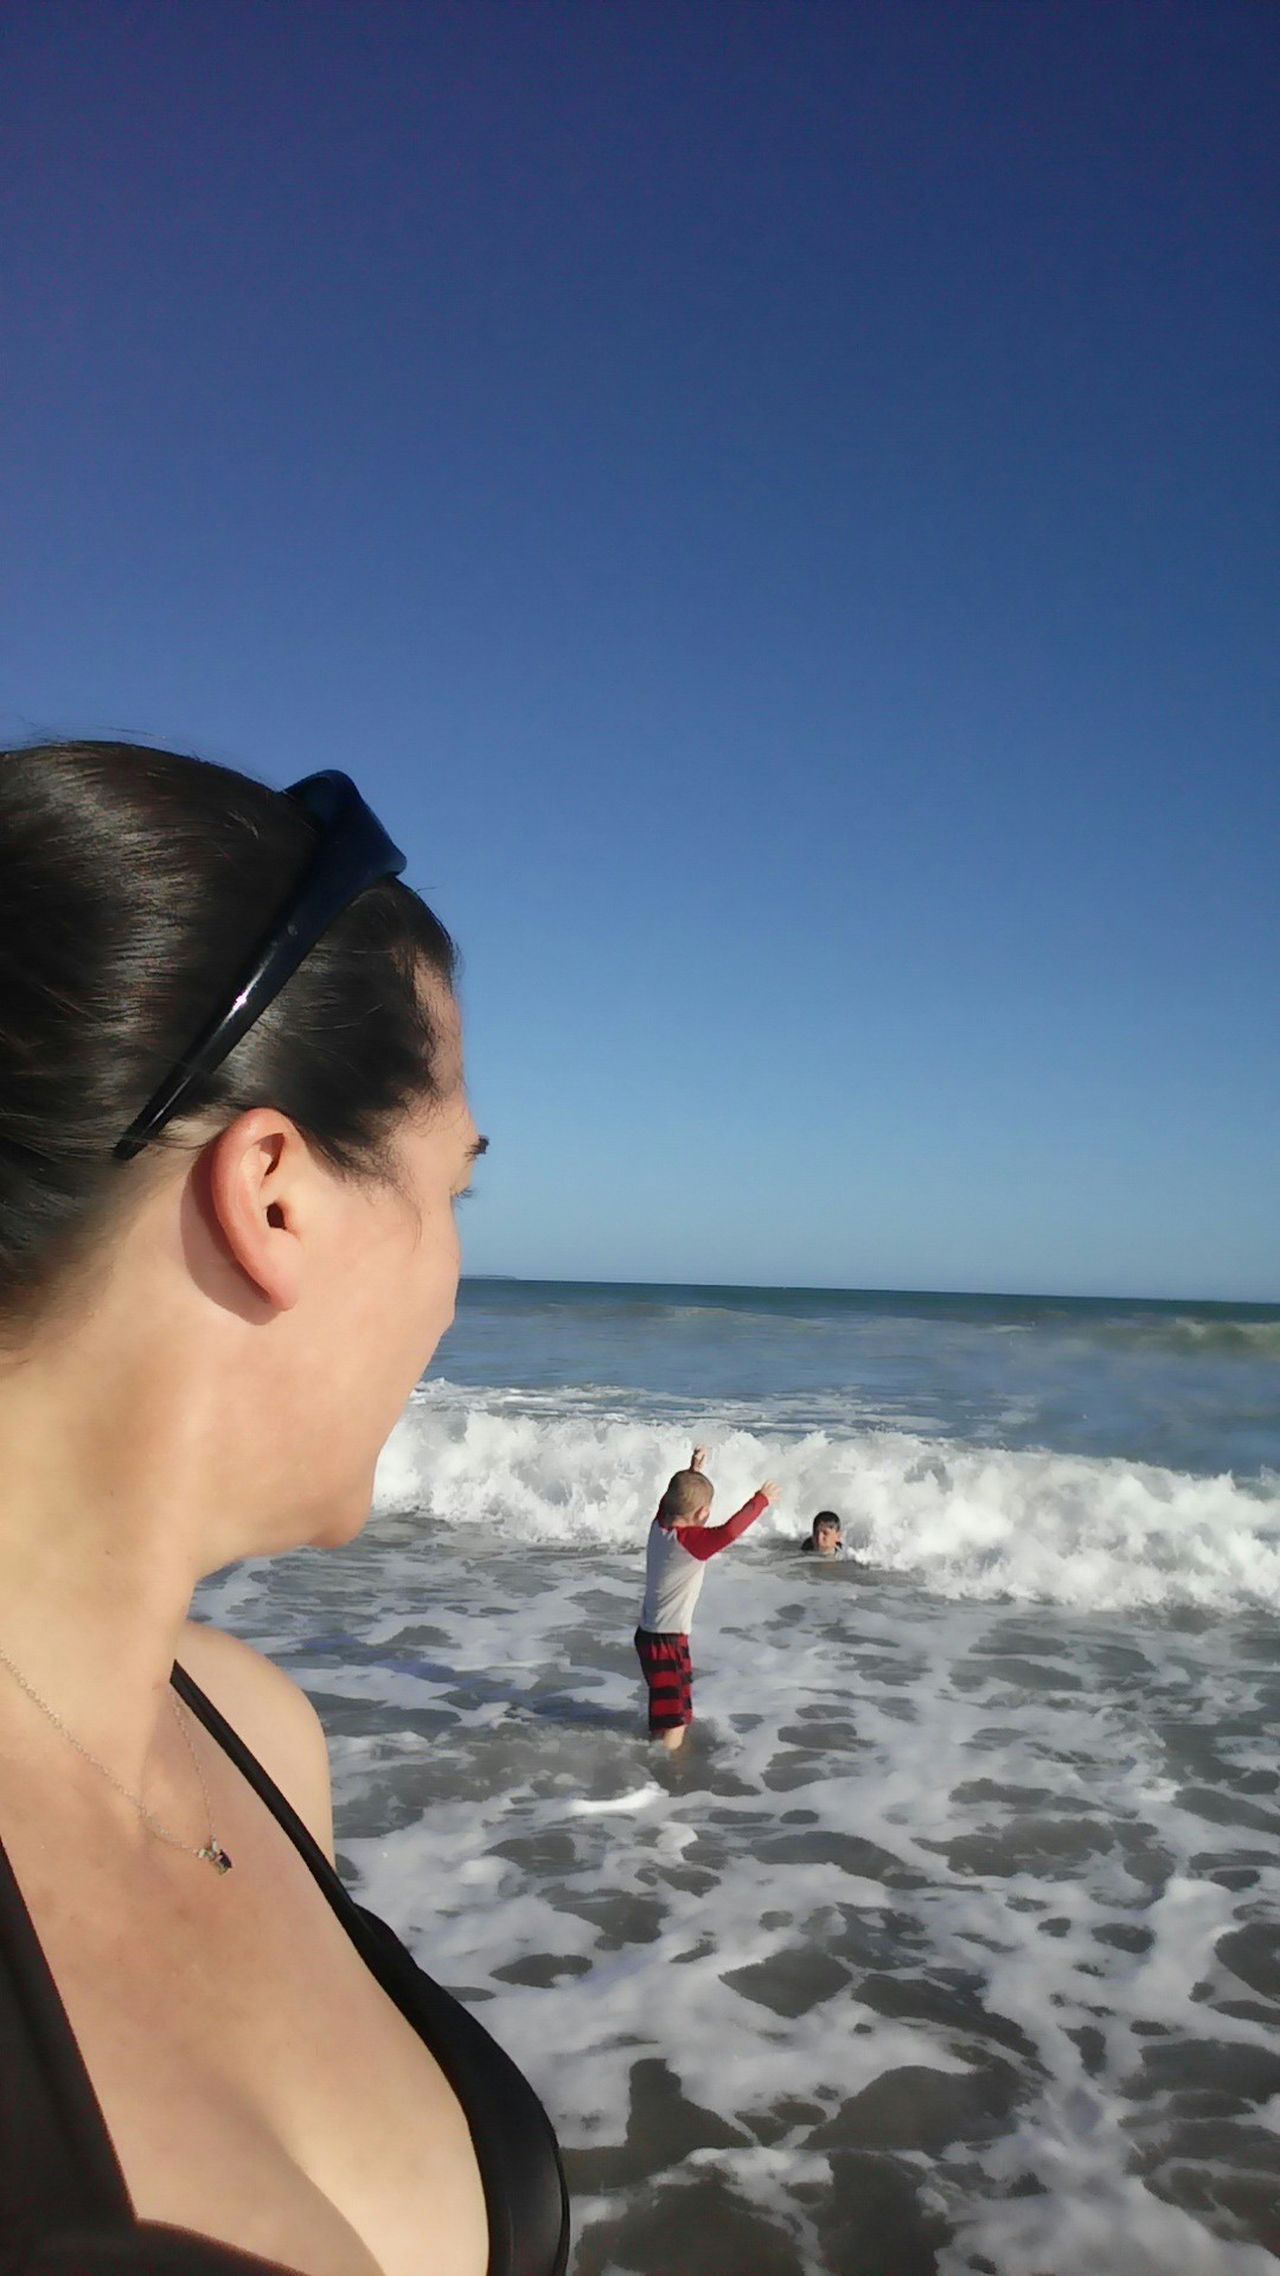 Children Distant Beach Mother Nephew  Son Adult Coastline Horizon Over Water Love New Zealand Leisure Activity Boys Waist Up Two Children Watching SeaVacations One Parent Bonding Showcase: February Colour Image Surf Nz Beach Happiness